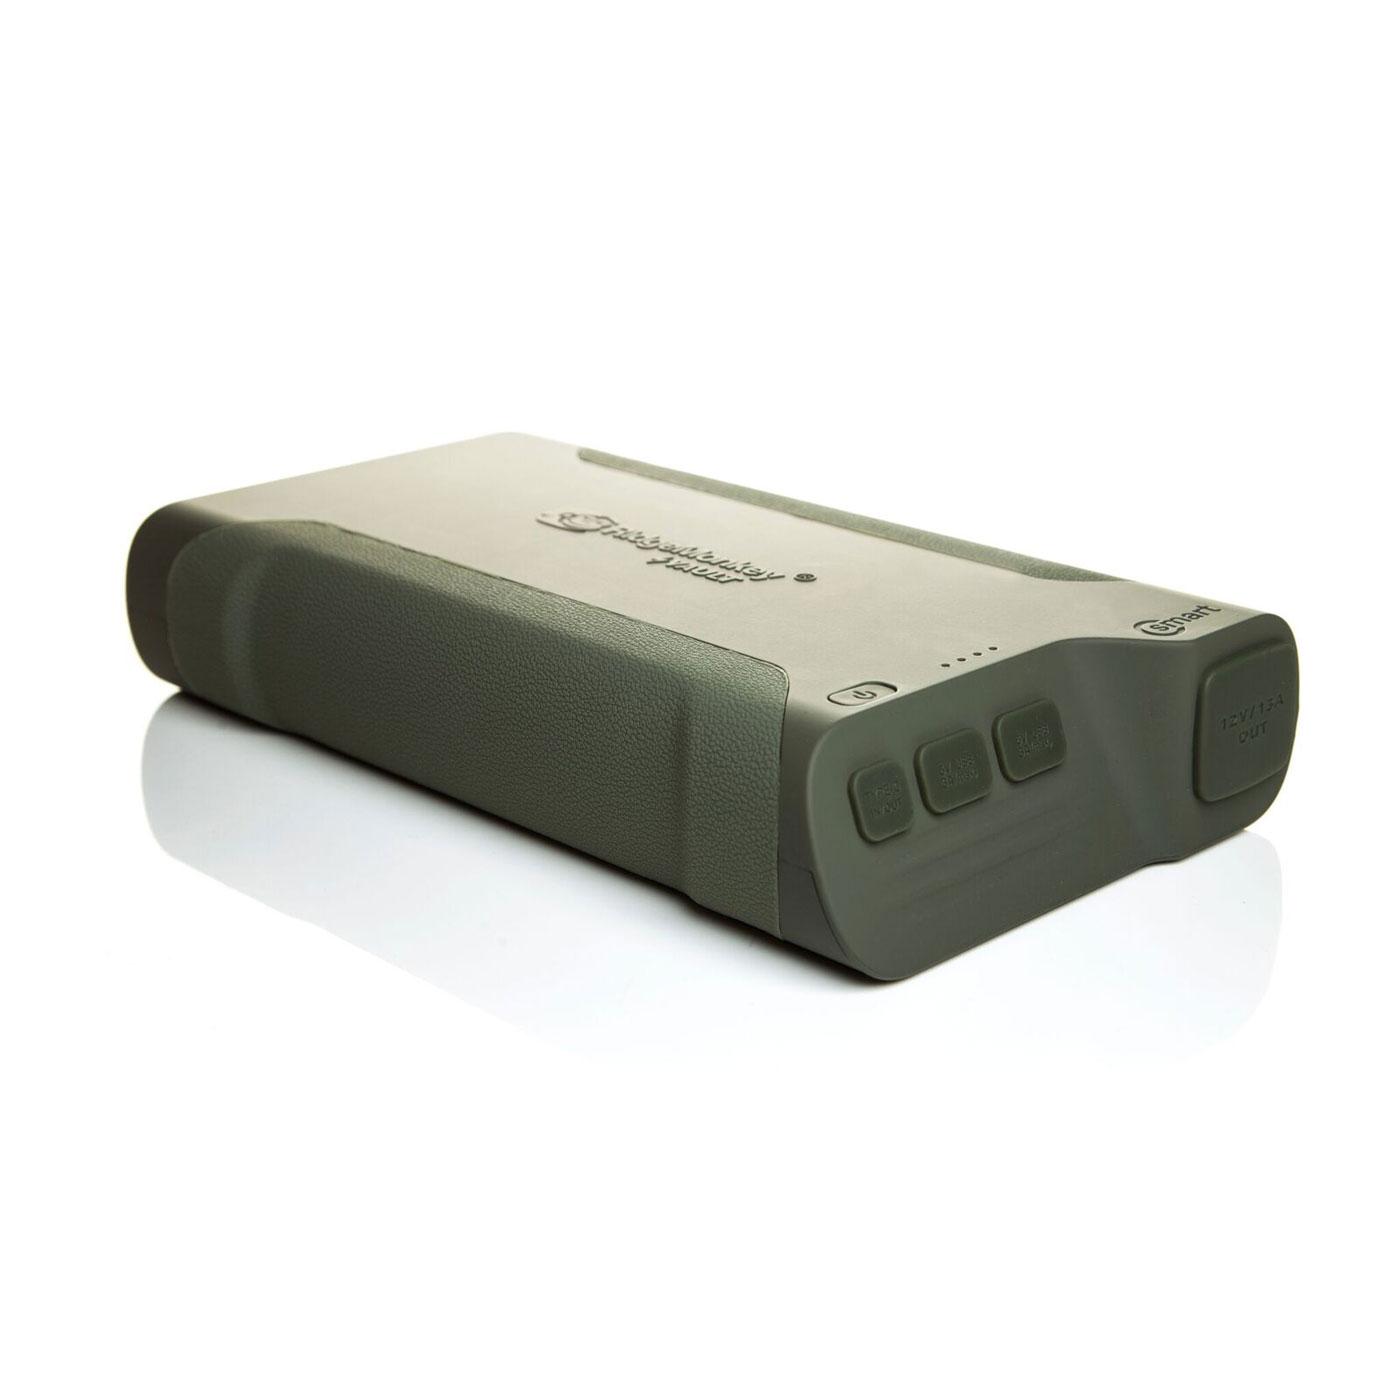 Ridgemonkey Vault C-Smart 42150mAh Gunmetal Green